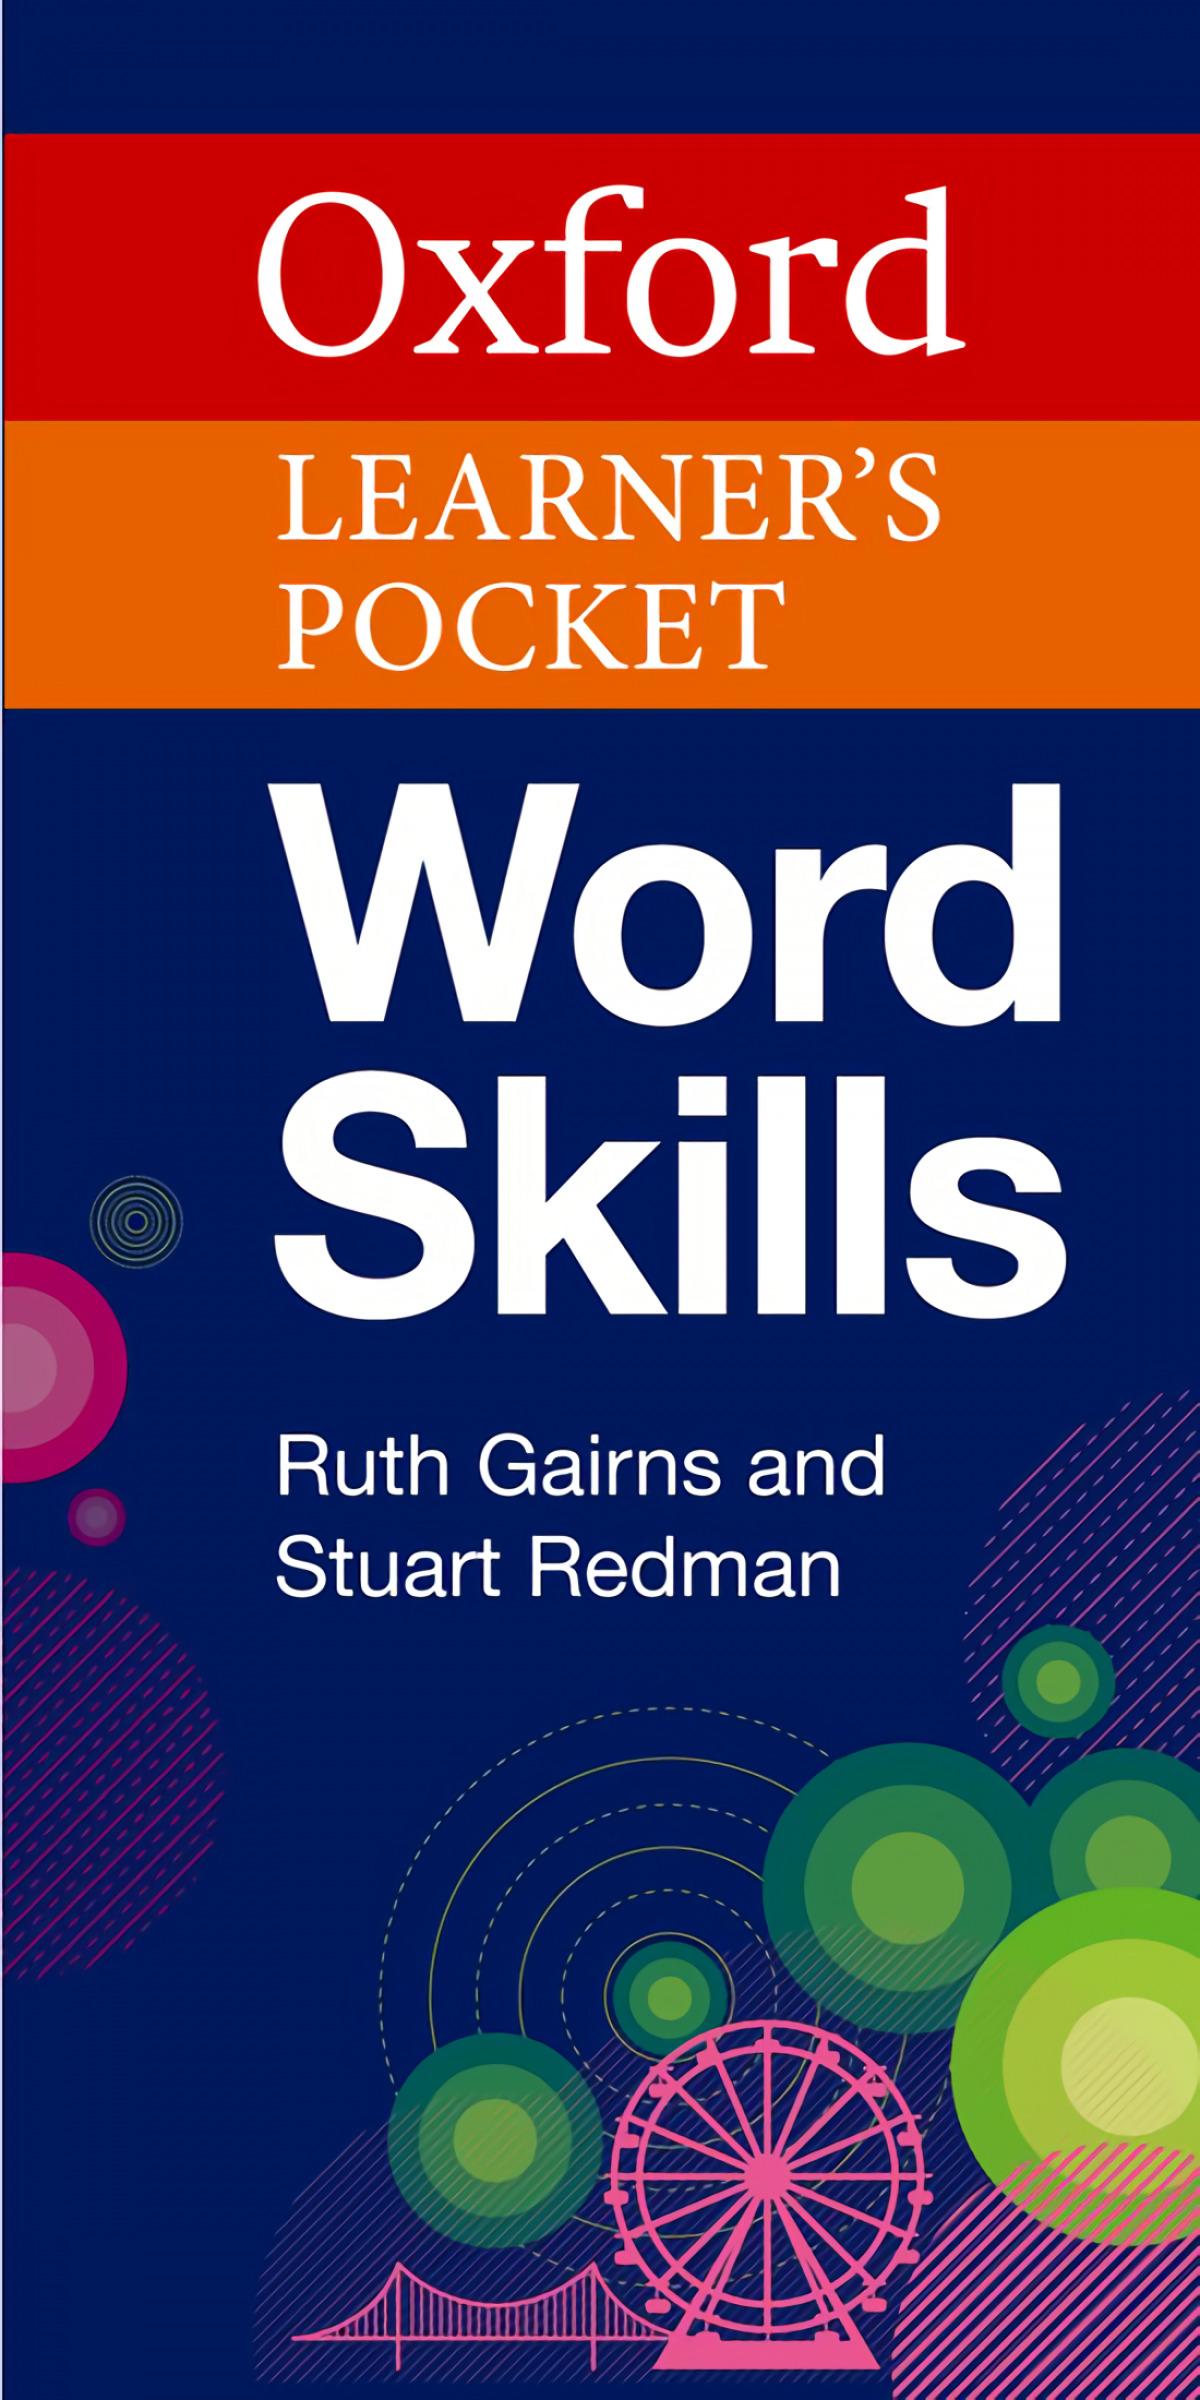 Oxford Learners Pocket Word Skills 9780194620147